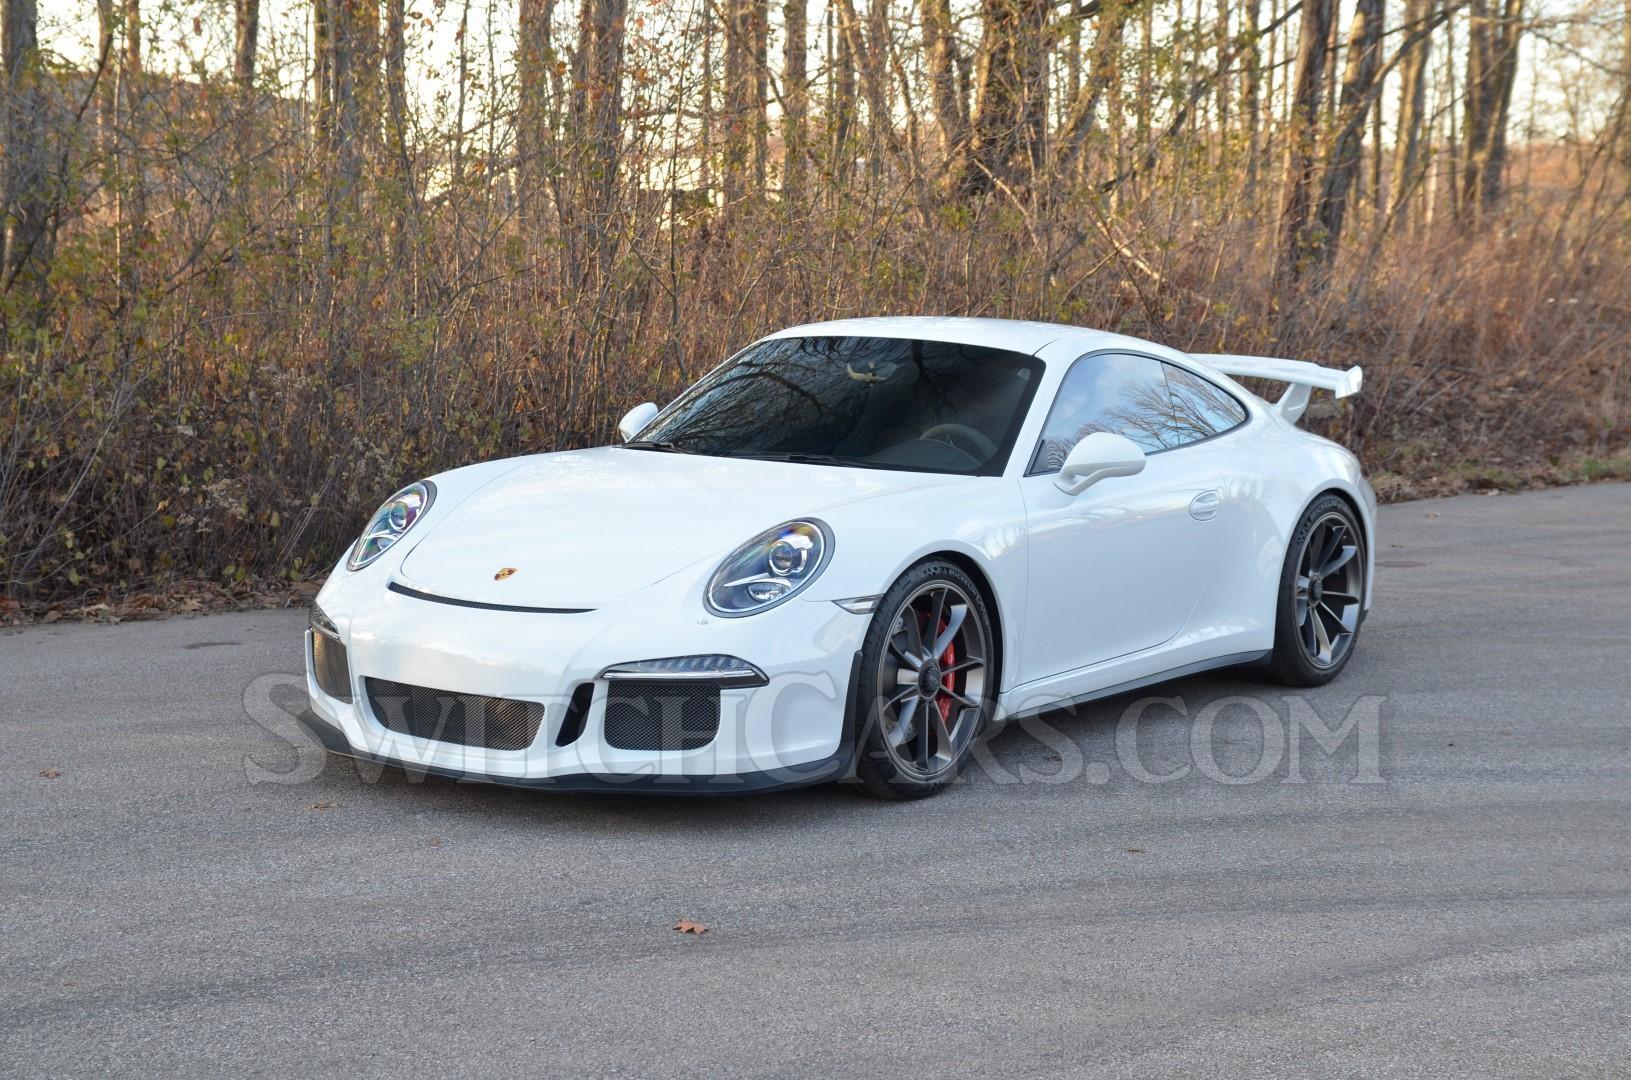 2014 Porsche GT3 w/10yr engine warranty, Special year-end ...